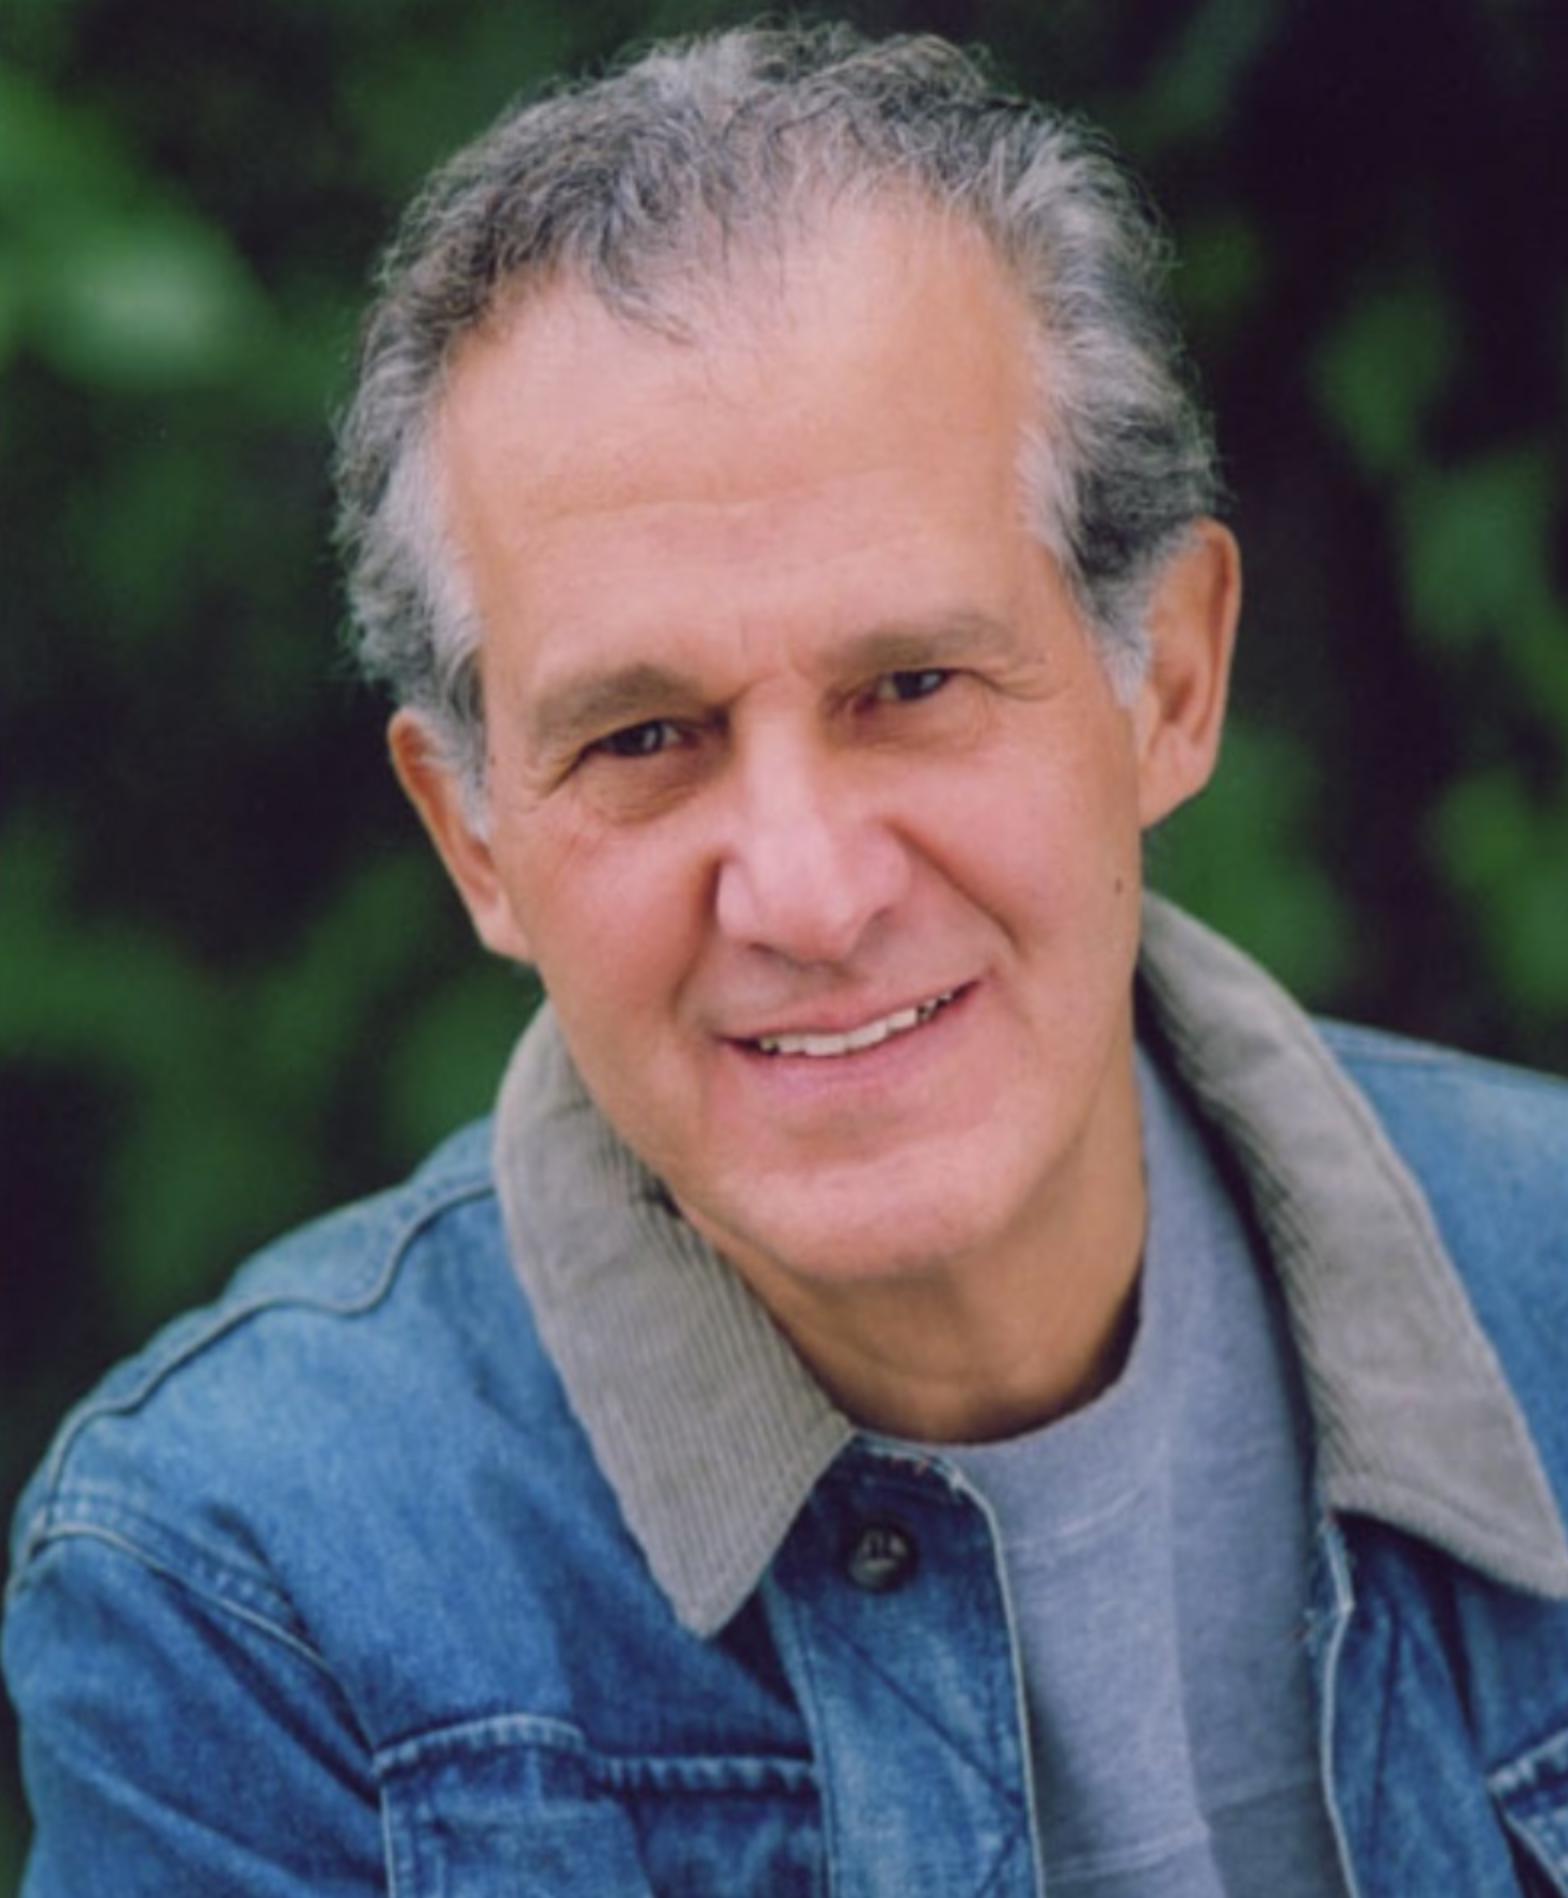 Robert Burgos